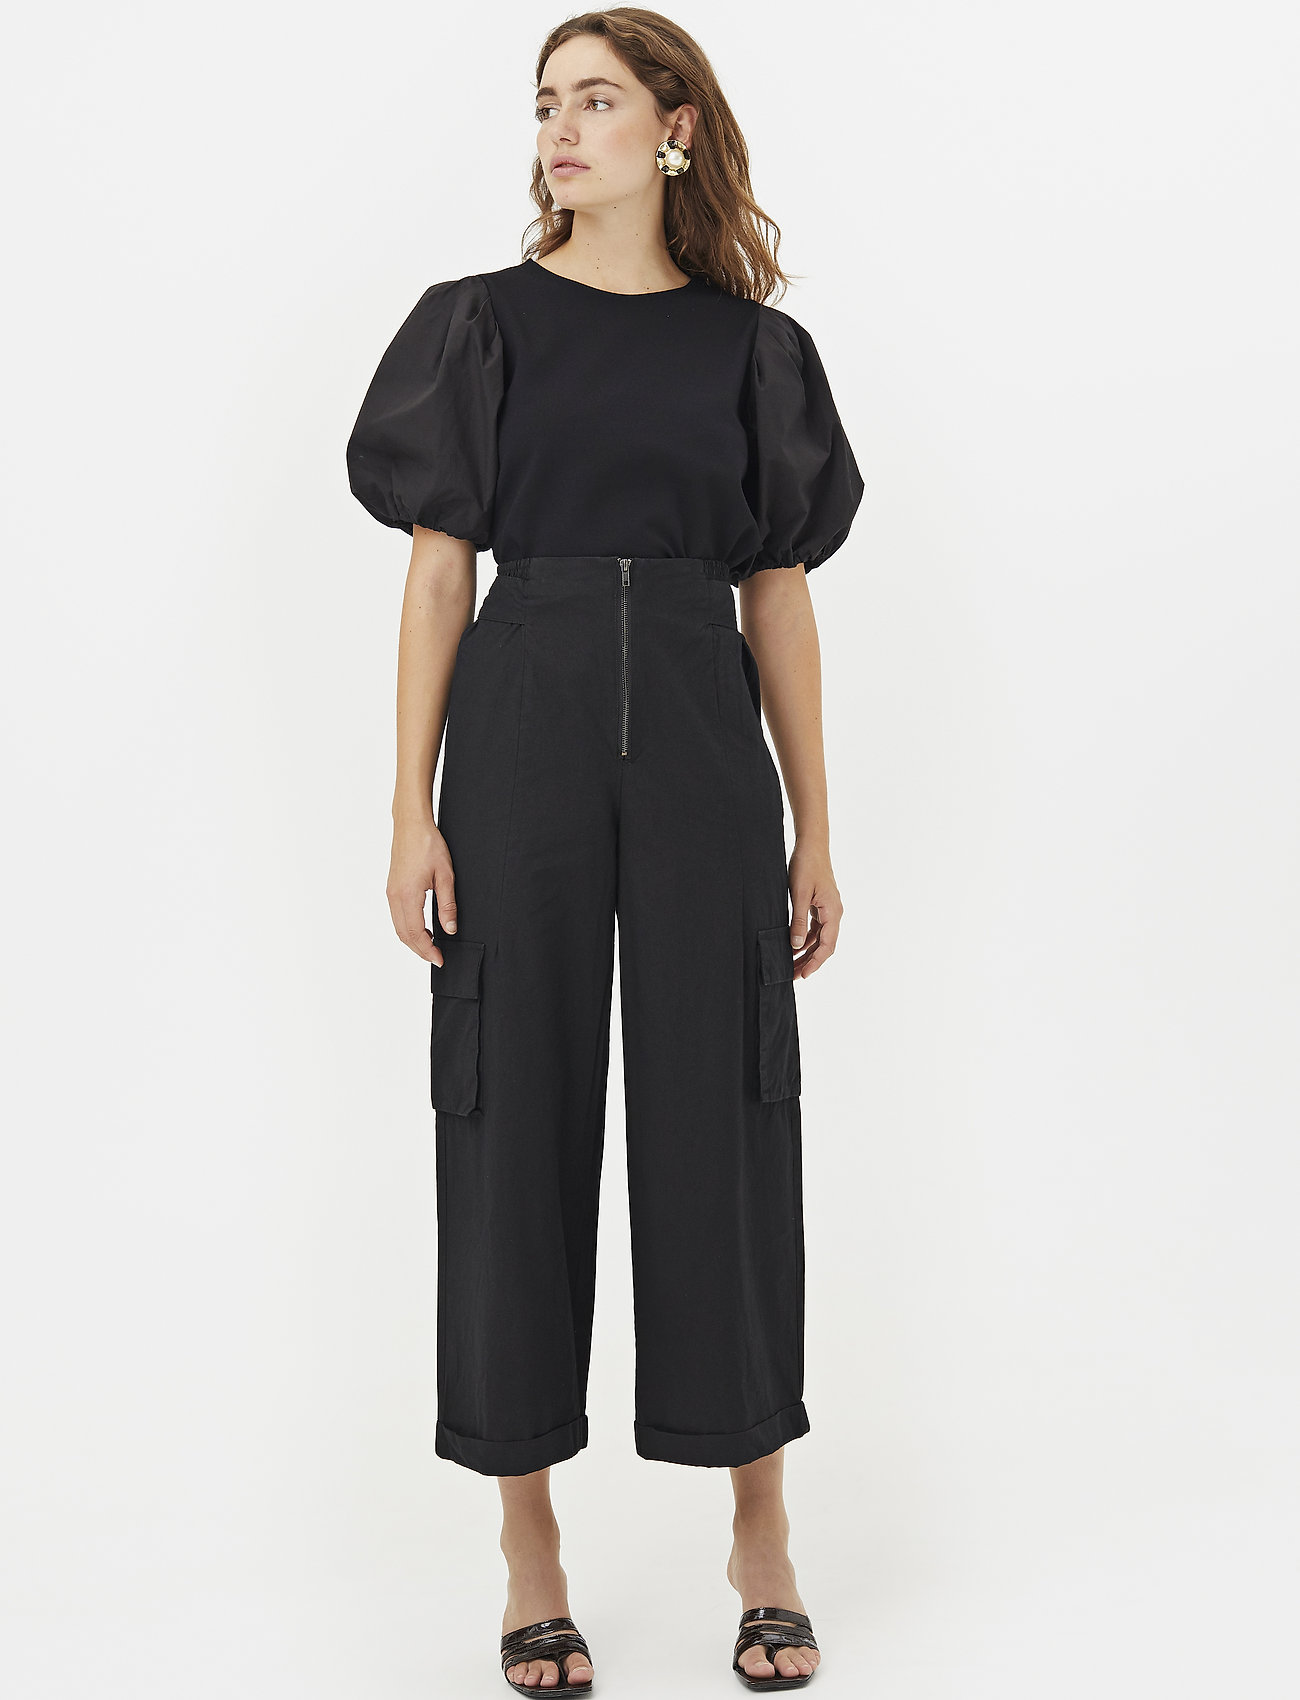 Gestuz - ImaGZ blouse HS20 - short-sleeved blouses - black - 0